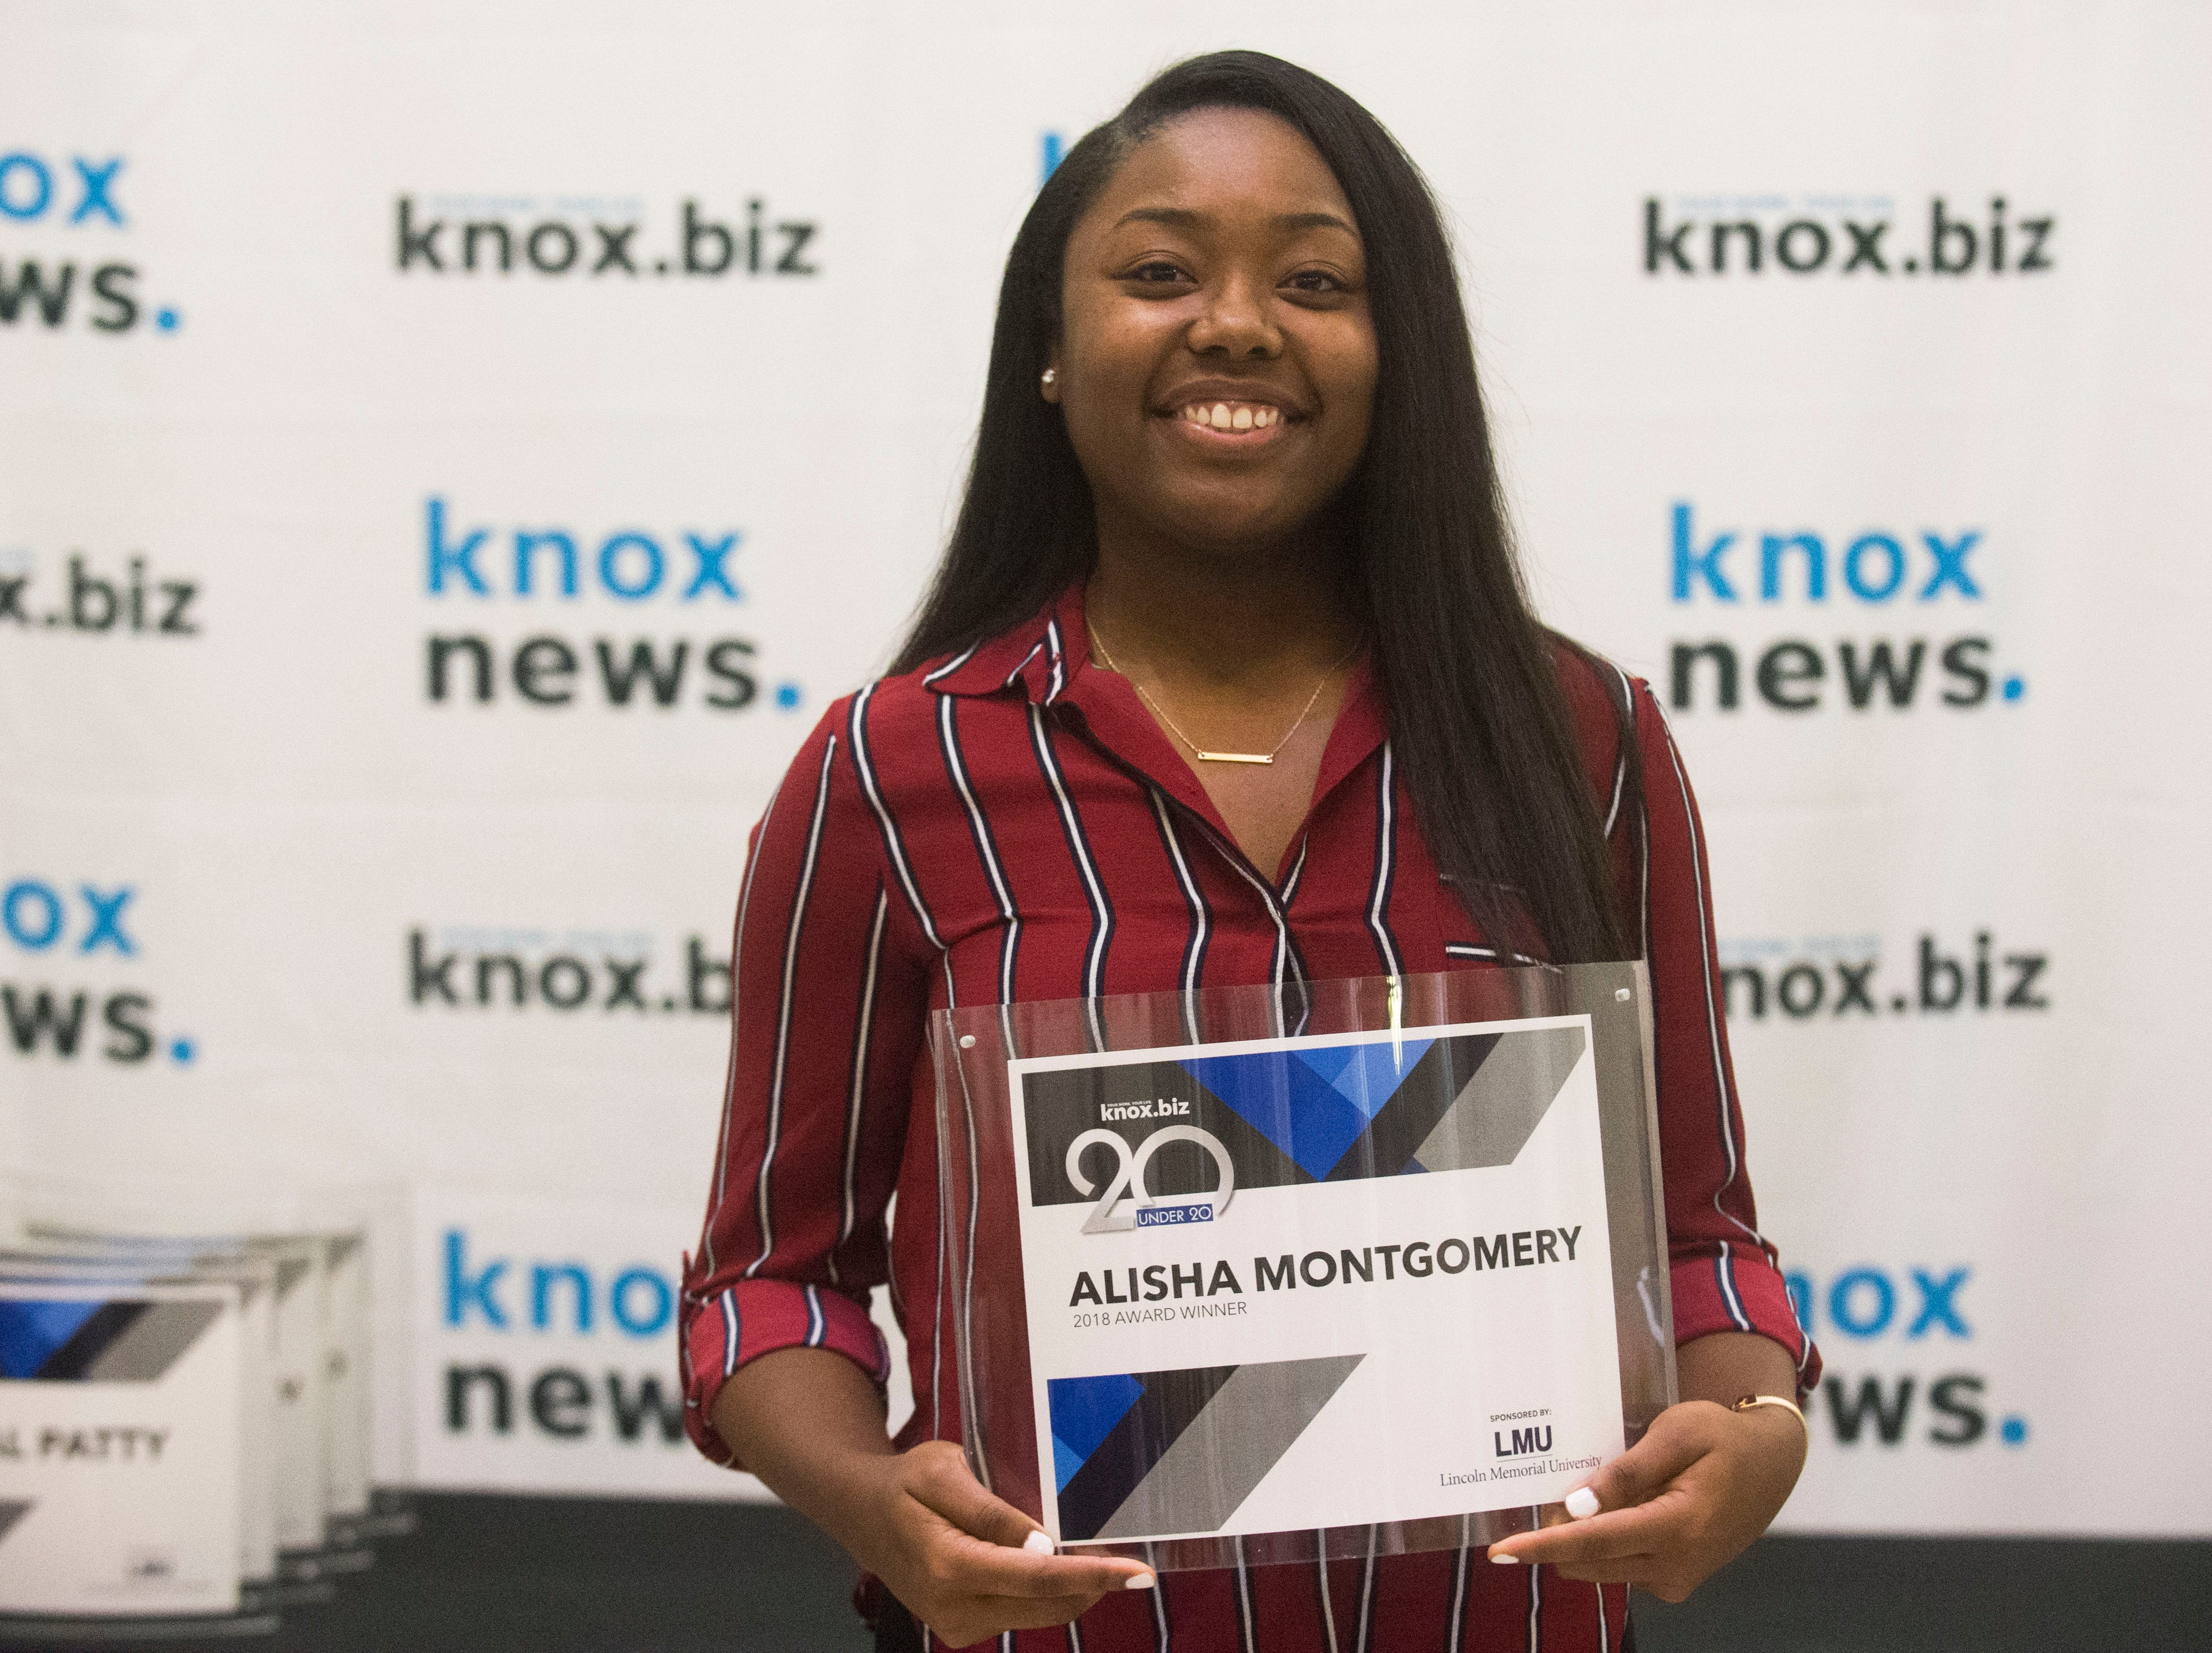 Alisha Montgomery, 20 under 20 award recipient.